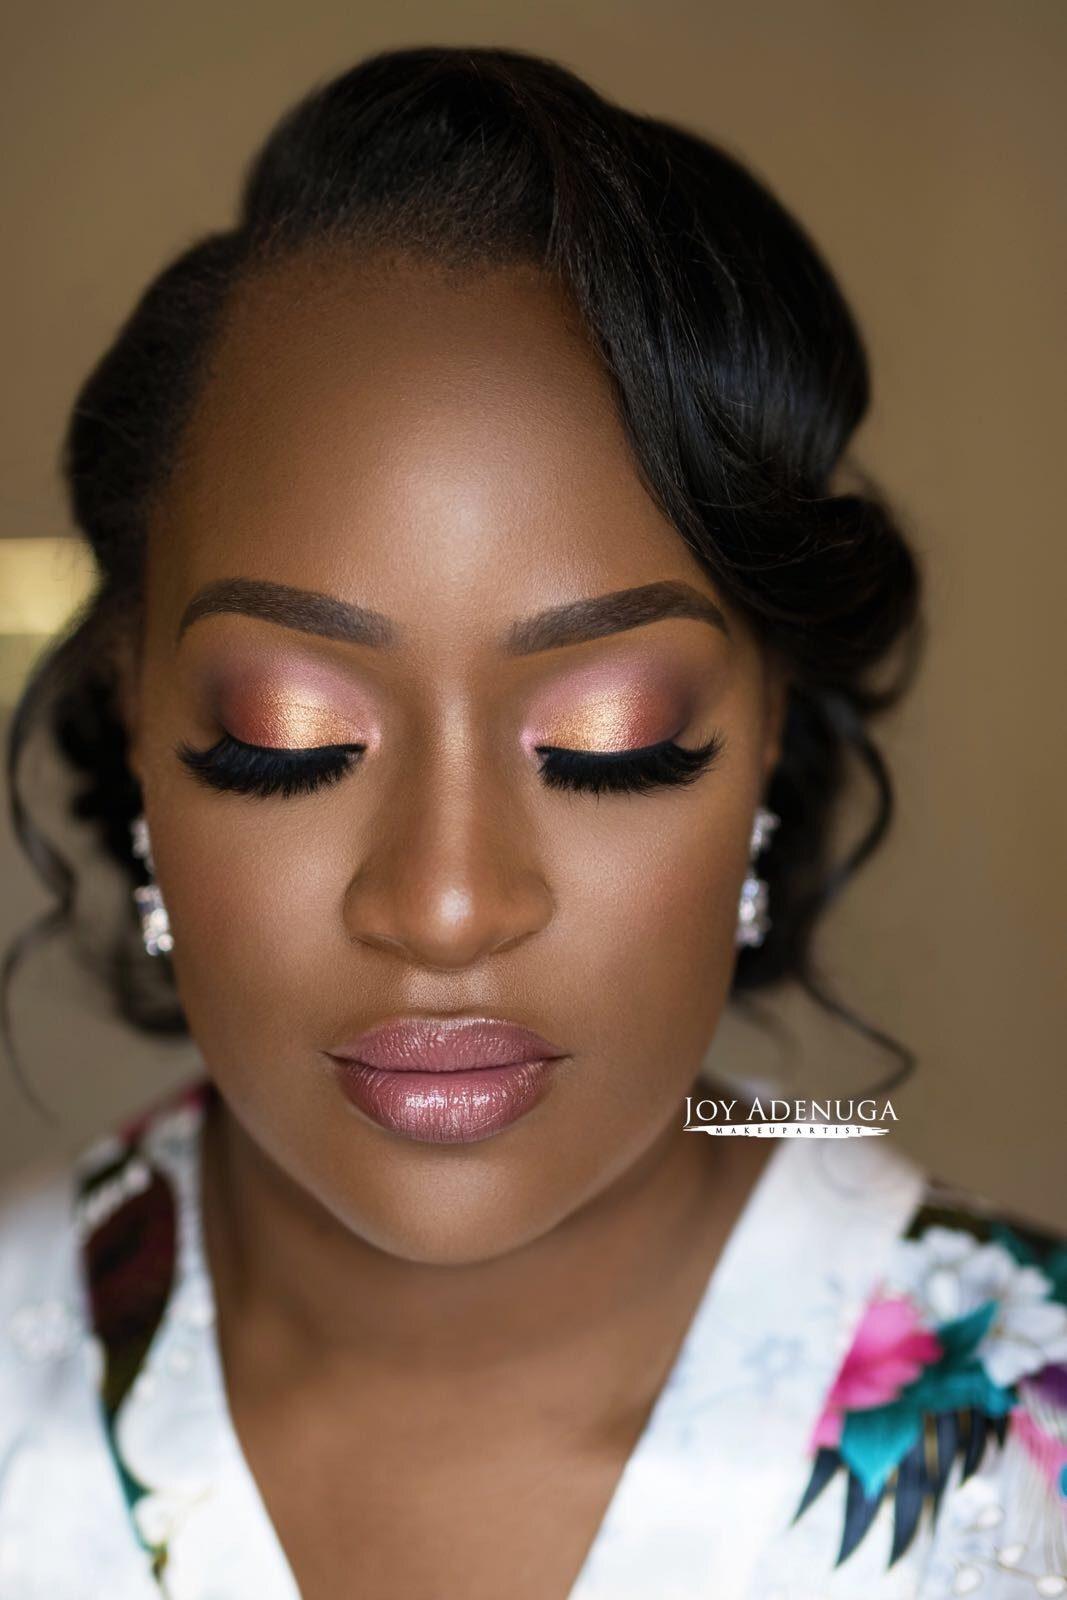 Chichi's Wedding, Joy Adenuga, Nigerian makeup artist London, Black brides, Black bride, black bridal blog london, Igbo bride, london black makeup artist, london makeup artist for black skin, black bridal makeup artist london, makeup artist for black skin, nigerian makeup artist london, makeup artist for women of colour